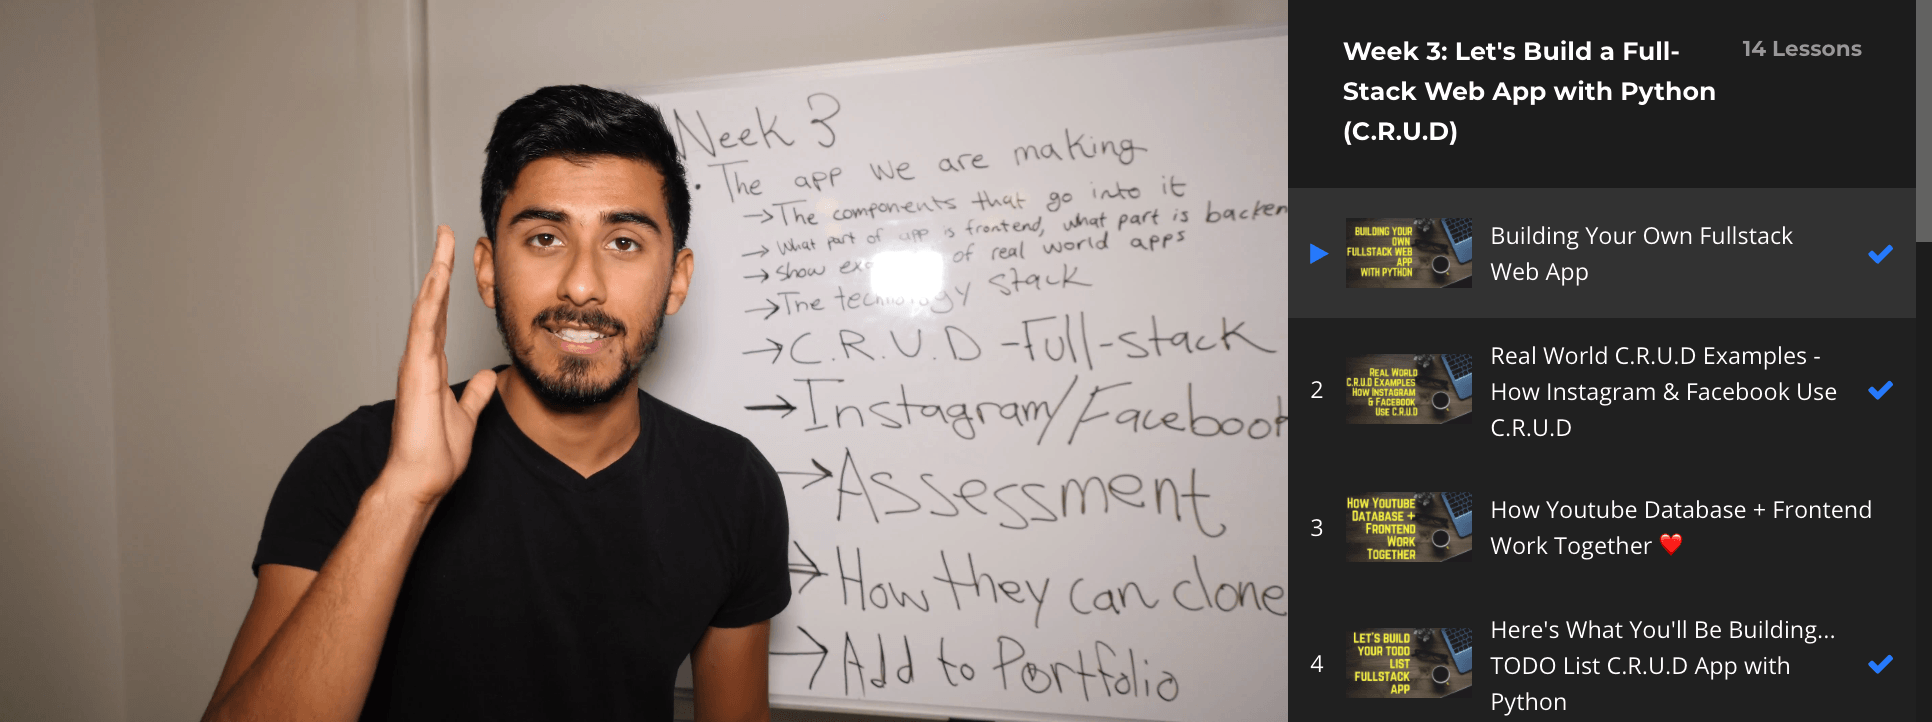 Rafeh Qazi - The Profitable Programmer Course 2.0 13